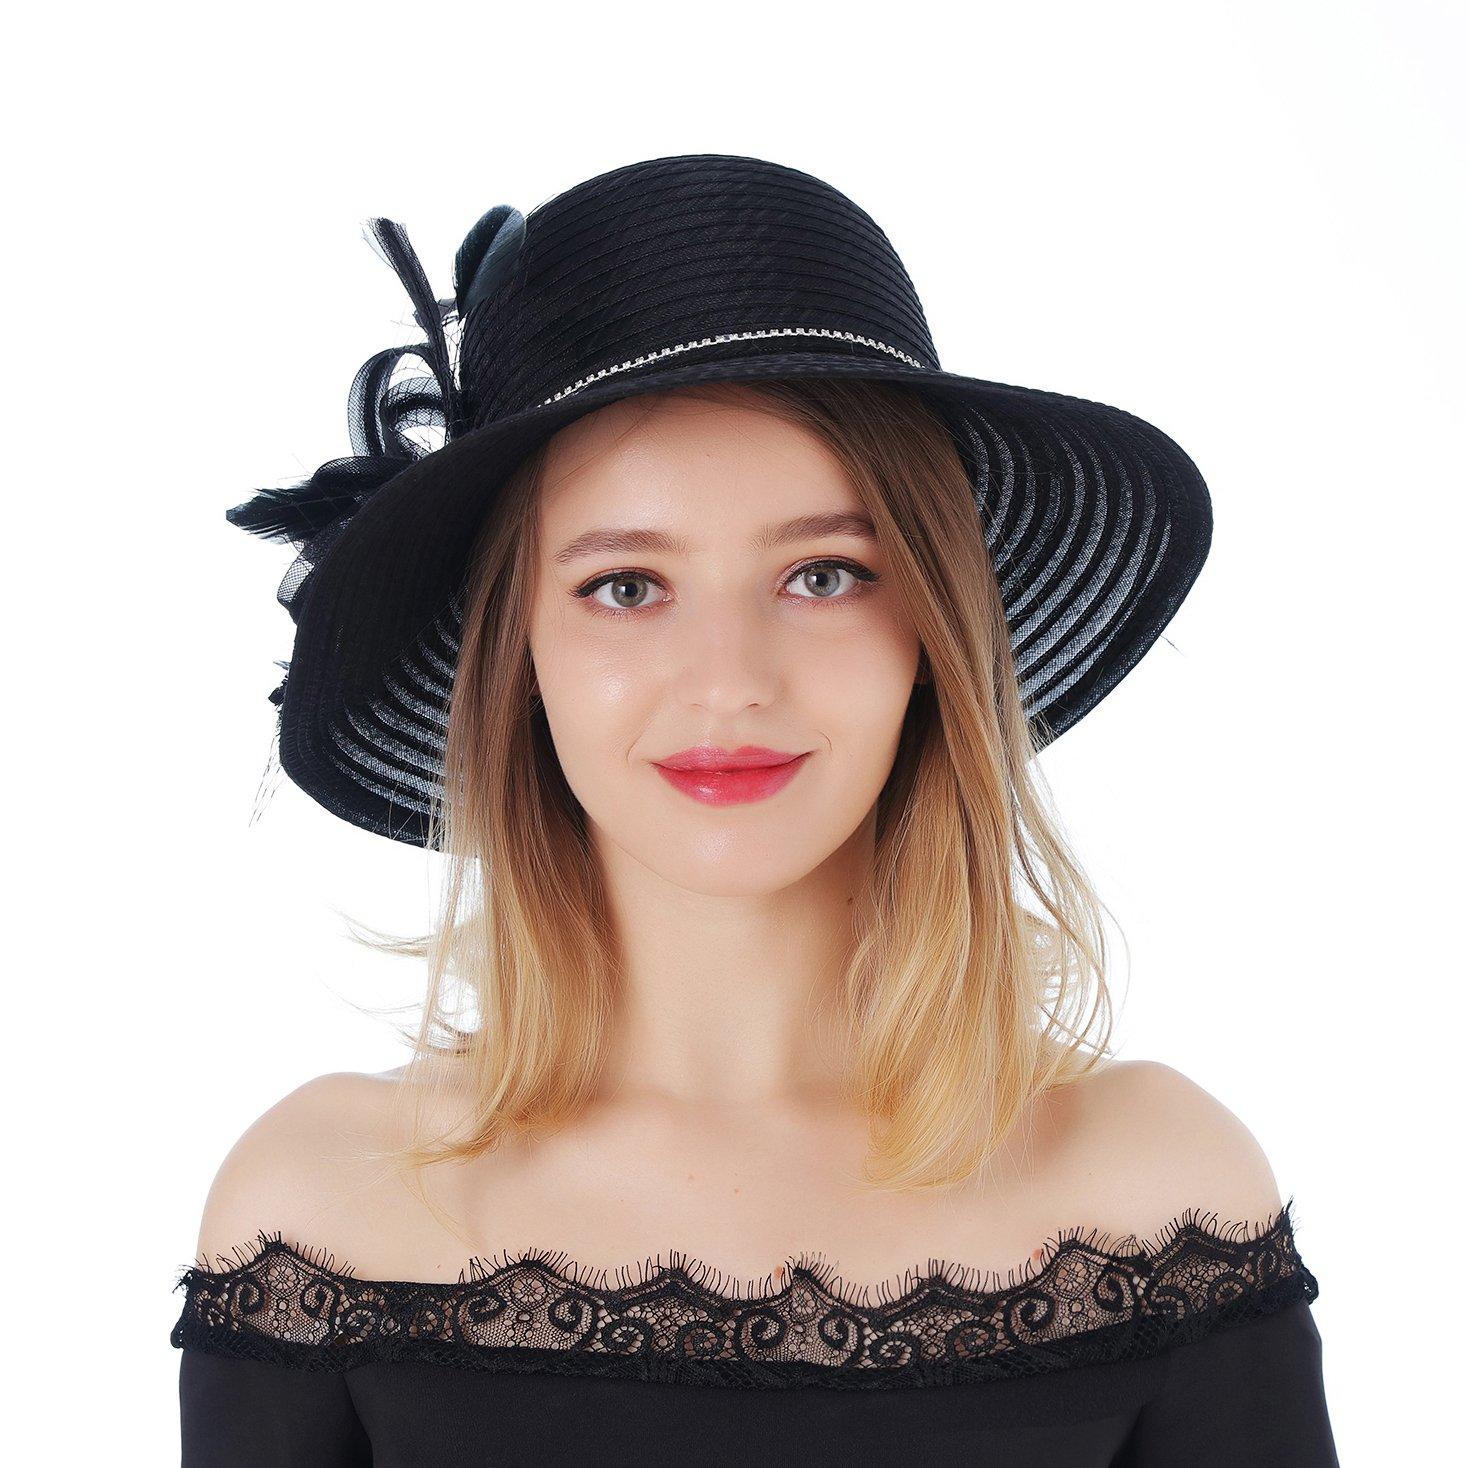 1f3e6b0ca9546 ... Church Cloche Hat Organza Bridal Dress Cap. Wholesale Price 16.99.  Material  Organza 100% Polyester. UV-Anti